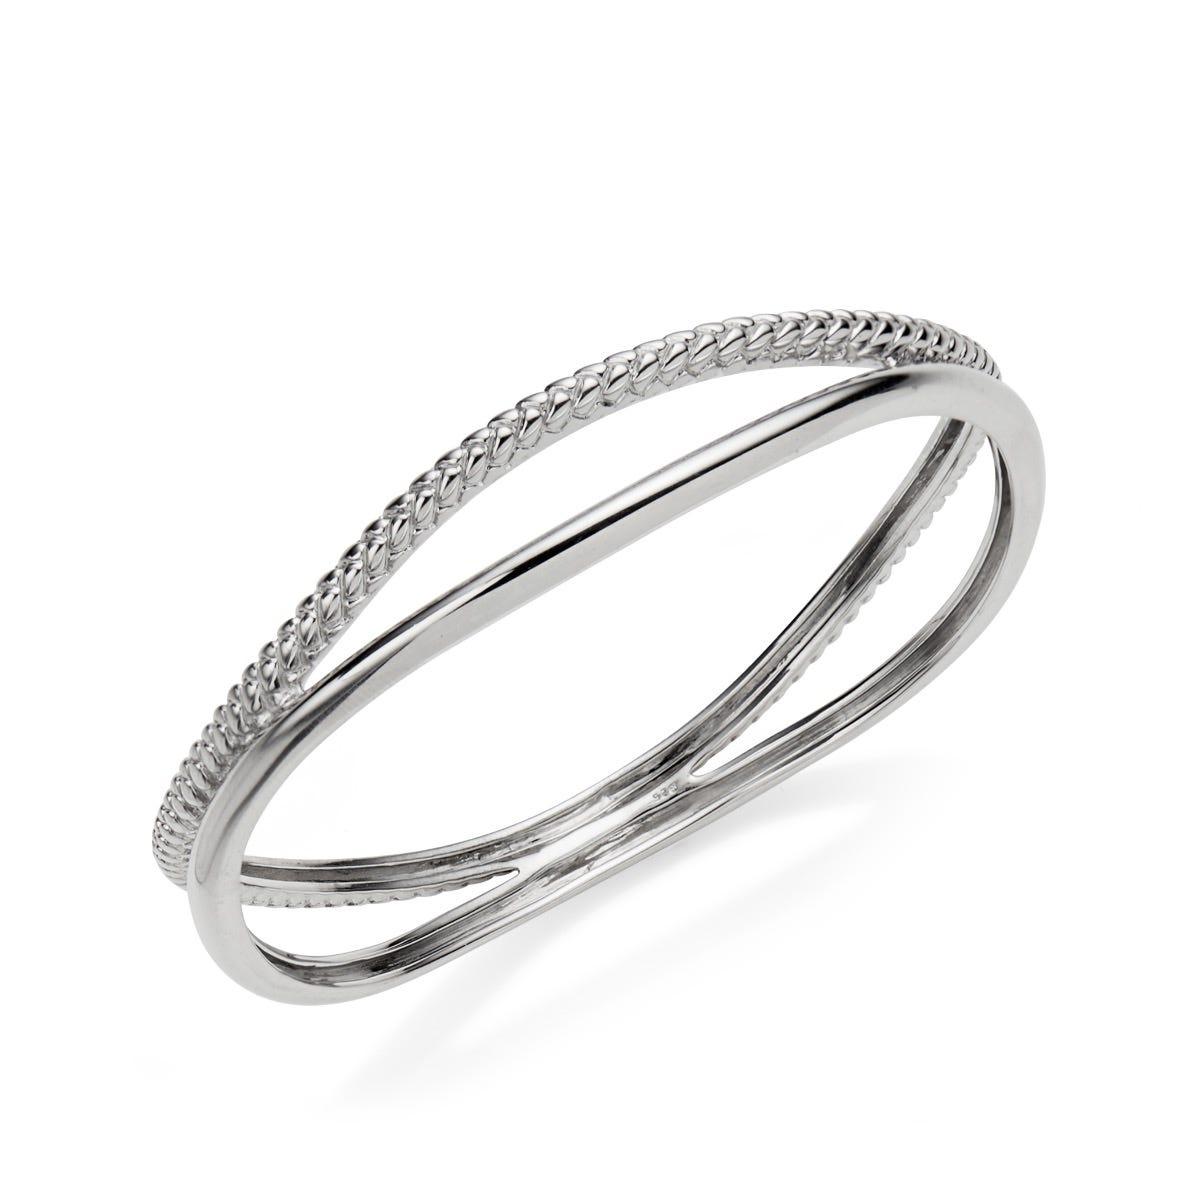 Braid Bangle Bracelet in Sterling Silver